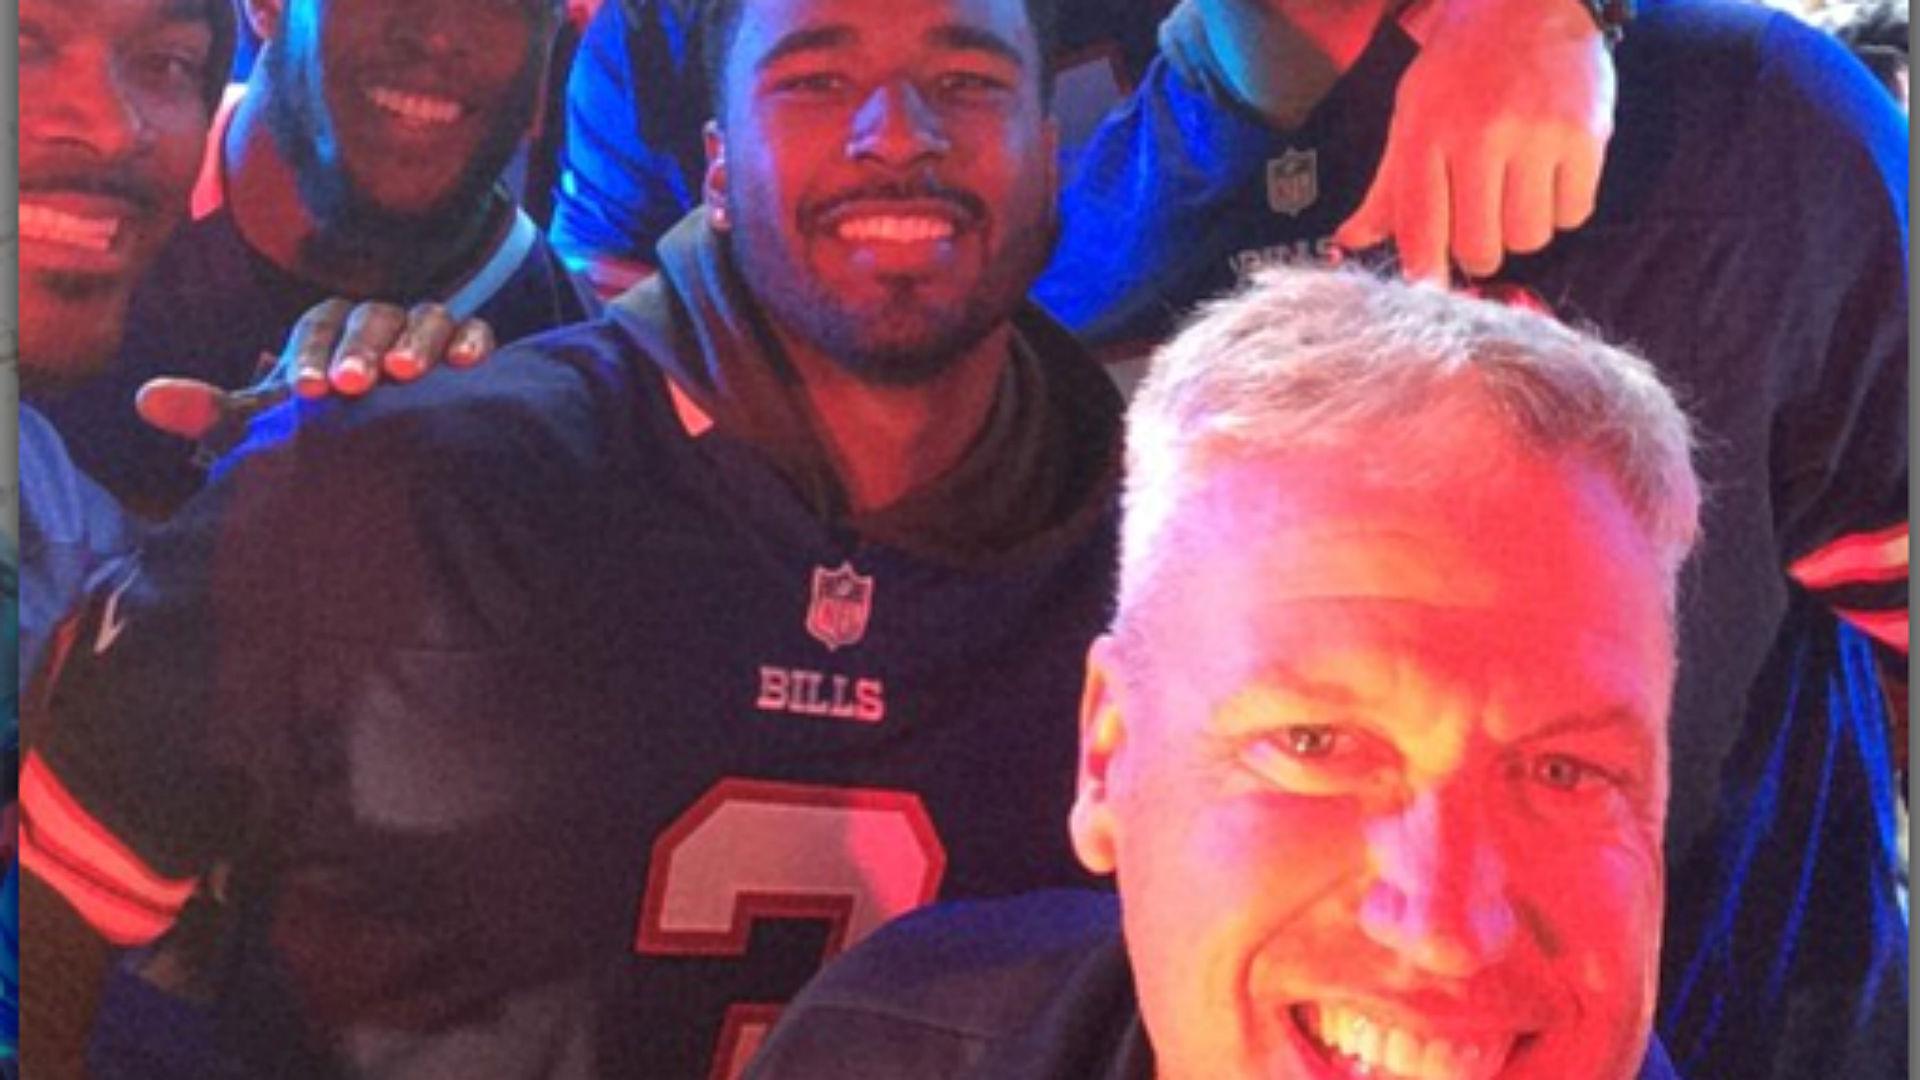 Rex Ryan and the Bills take on London